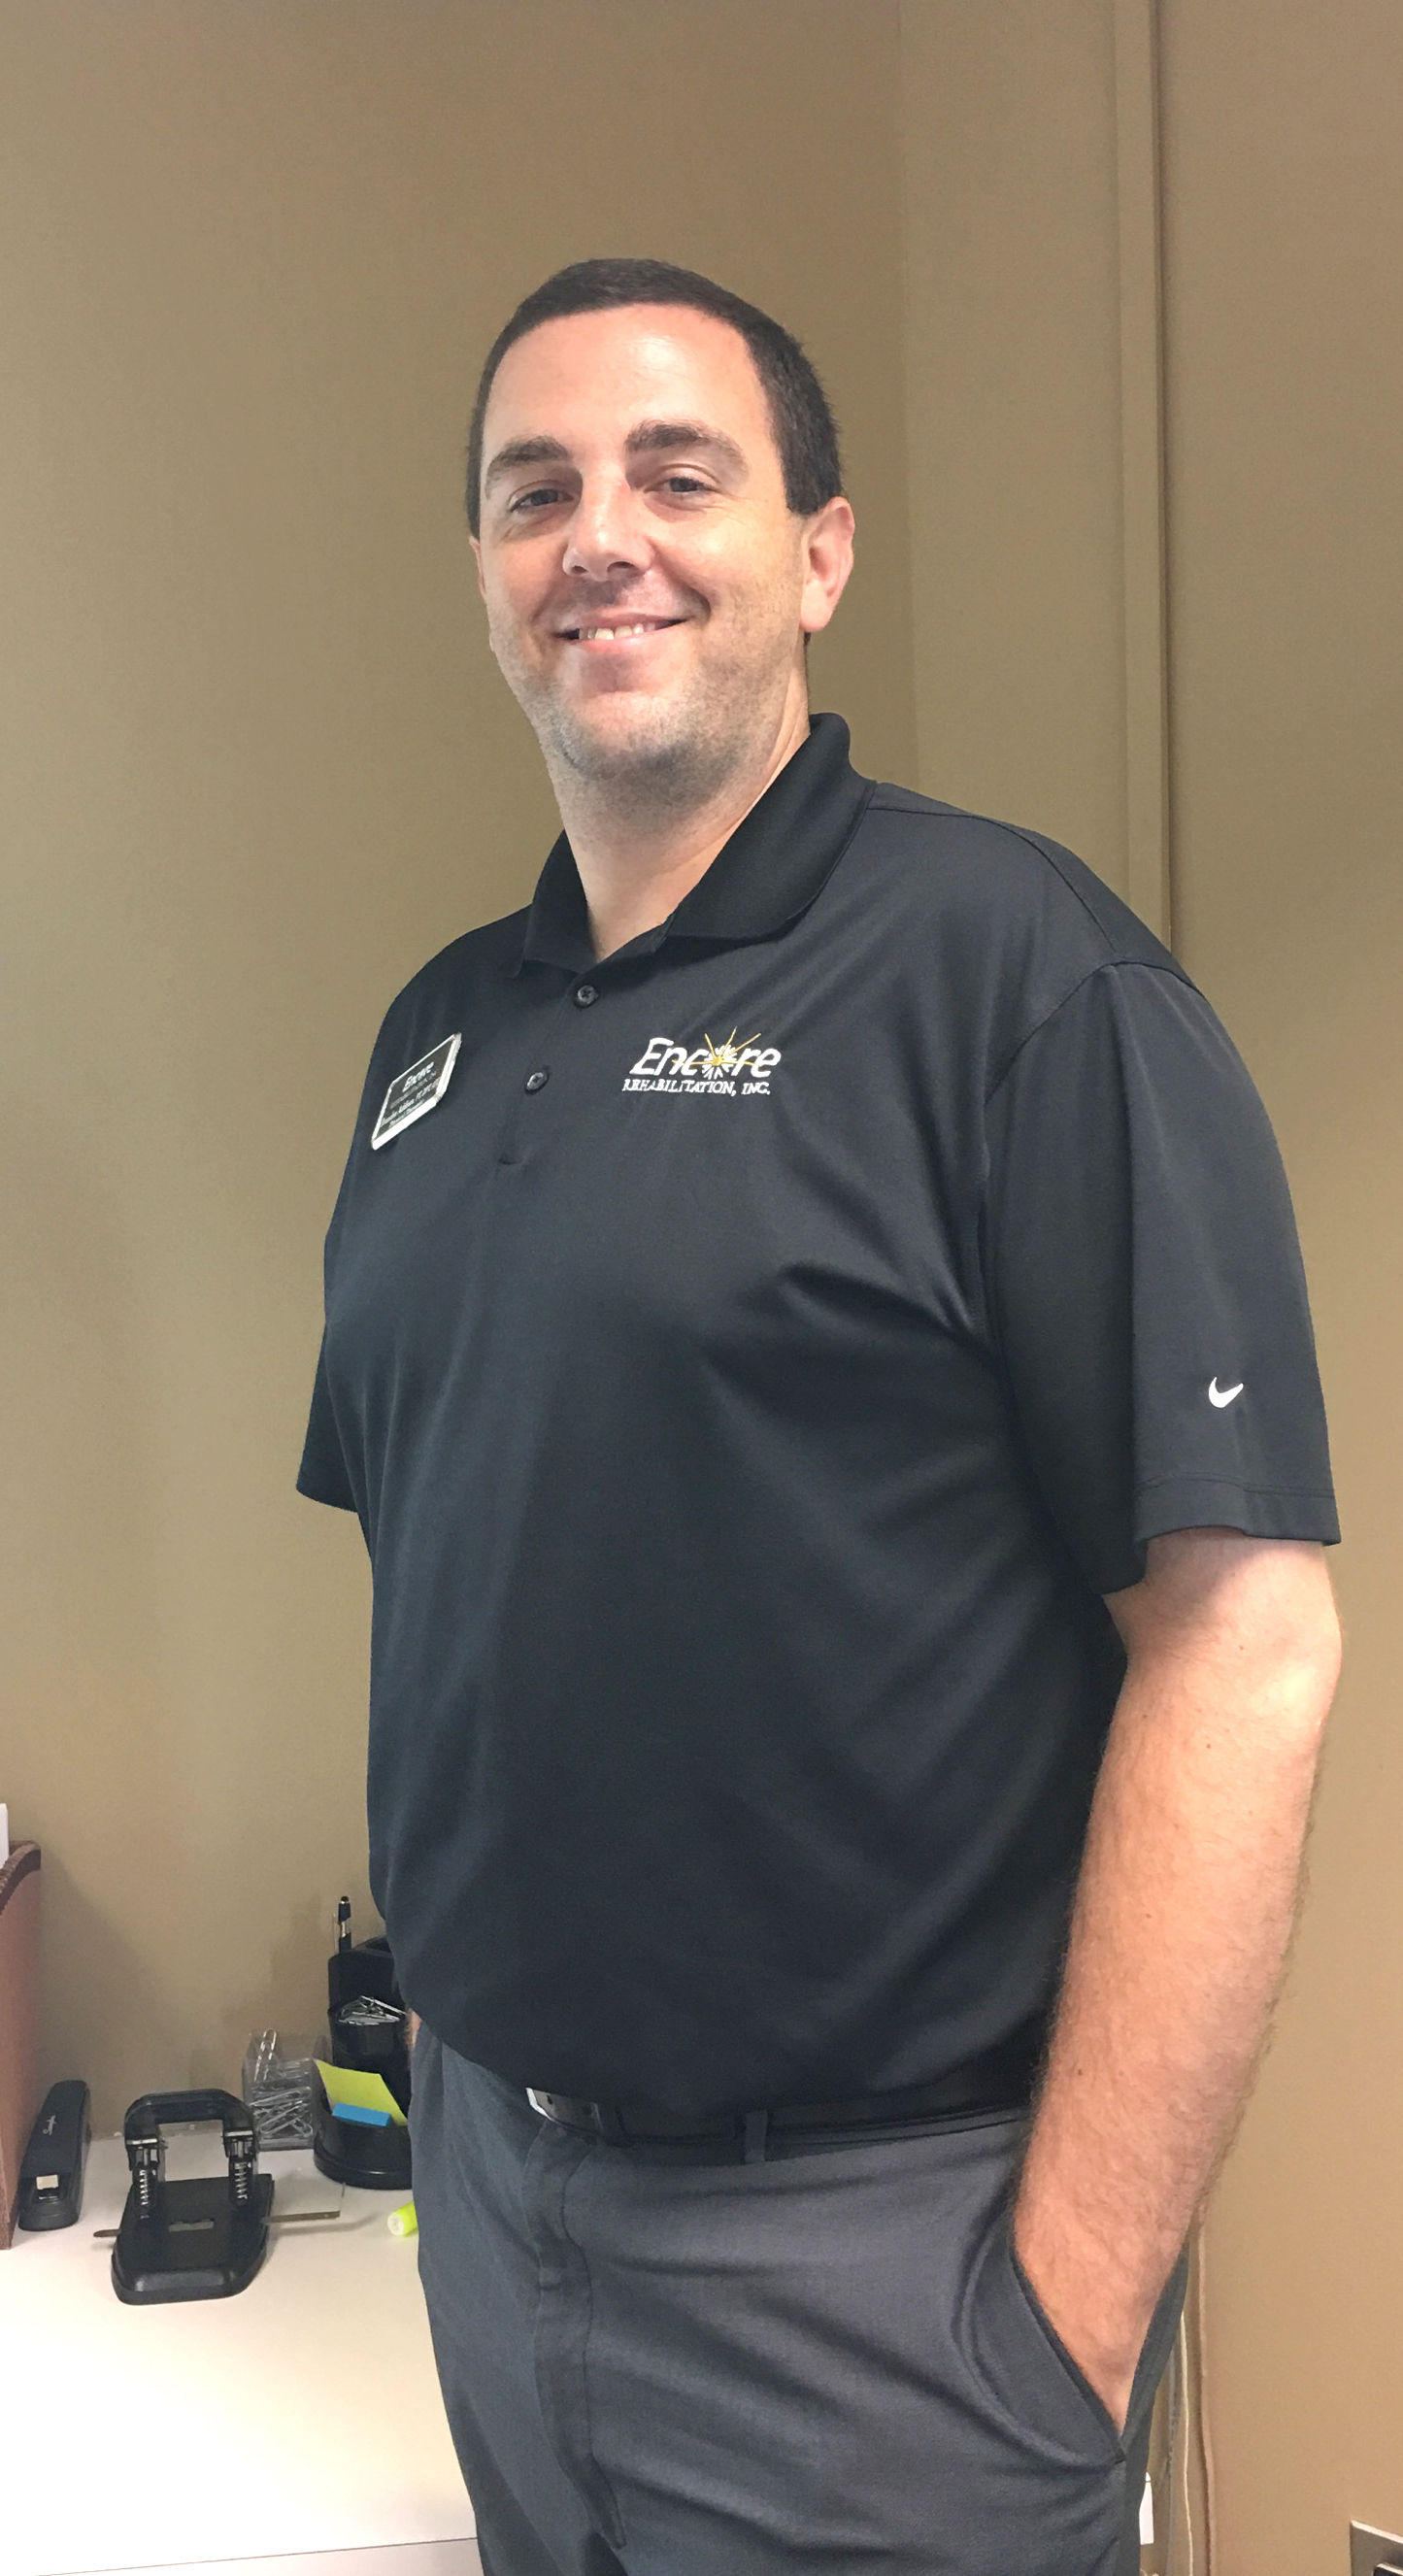 Encore Rehabilitation-Eufaula Clinical Director Brandon Addison, DPT, ATC